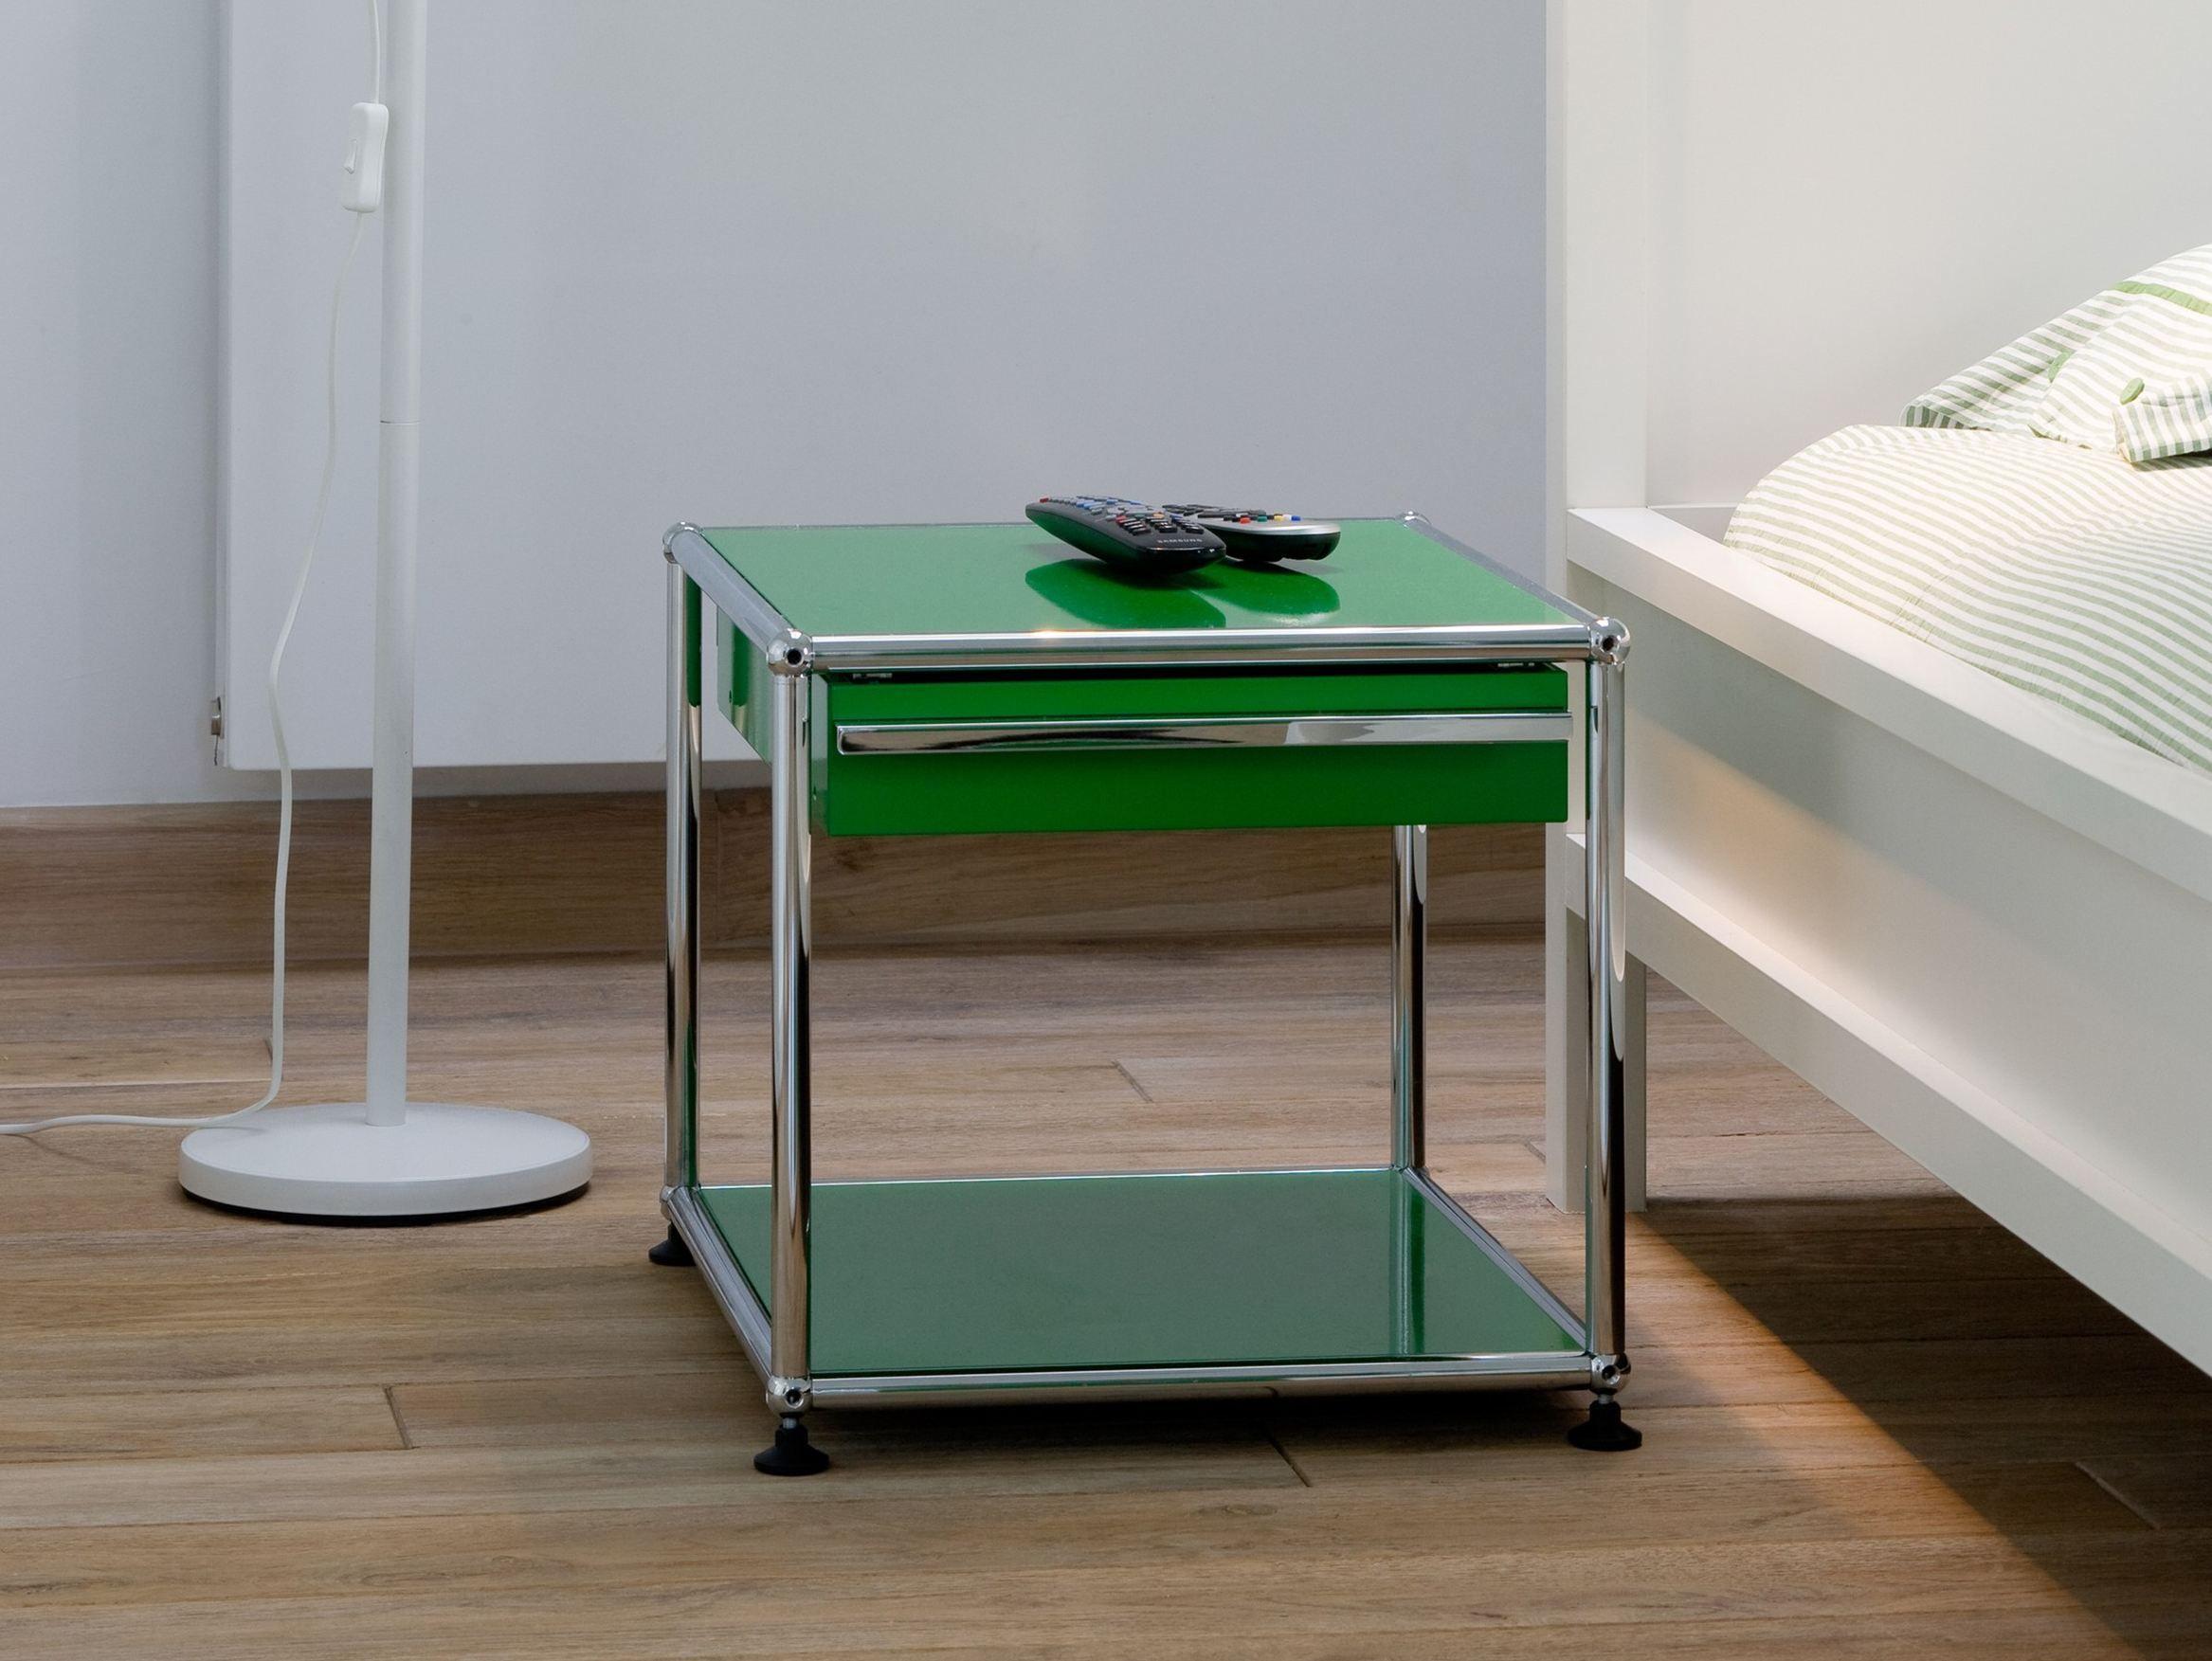 usm haller nightstand nachttisch by usm modular furniture design fritz haller. Black Bedroom Furniture Sets. Home Design Ideas